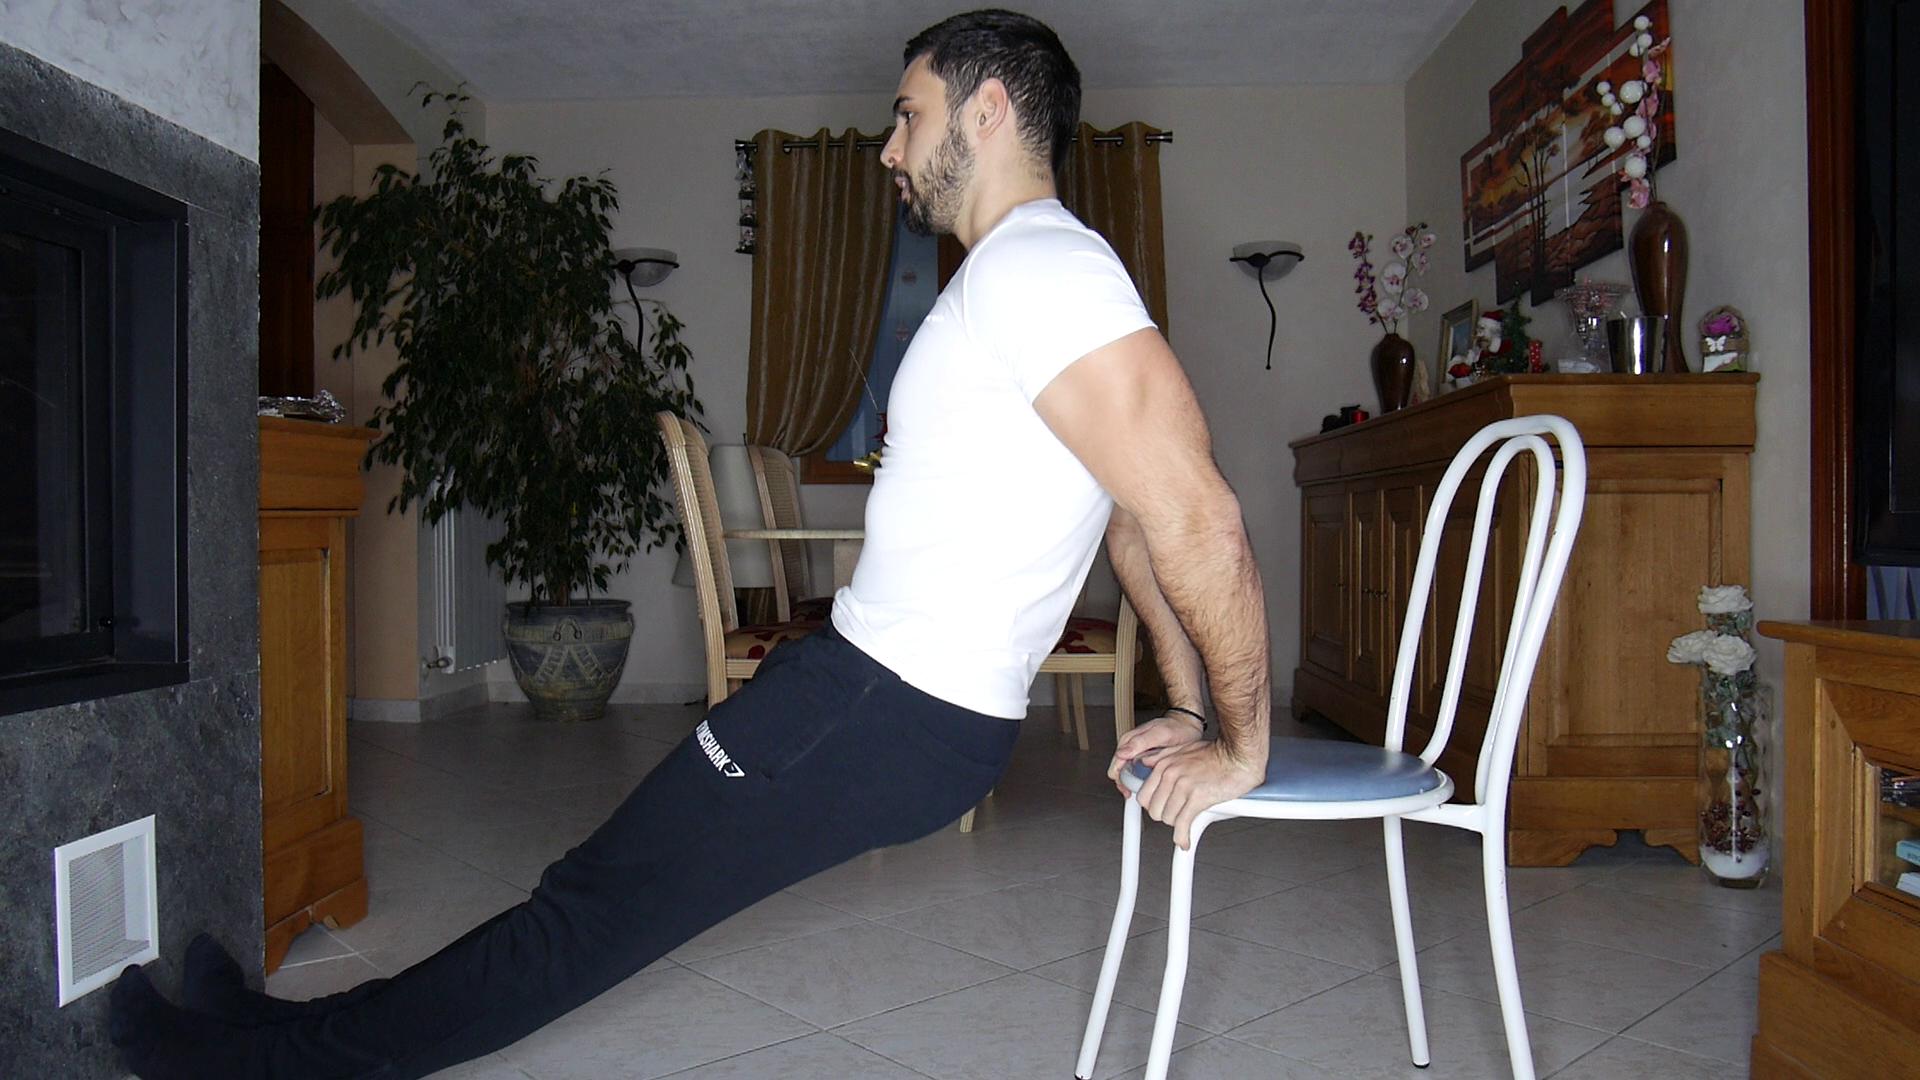 crunch-oblique-exercice-abdominaux